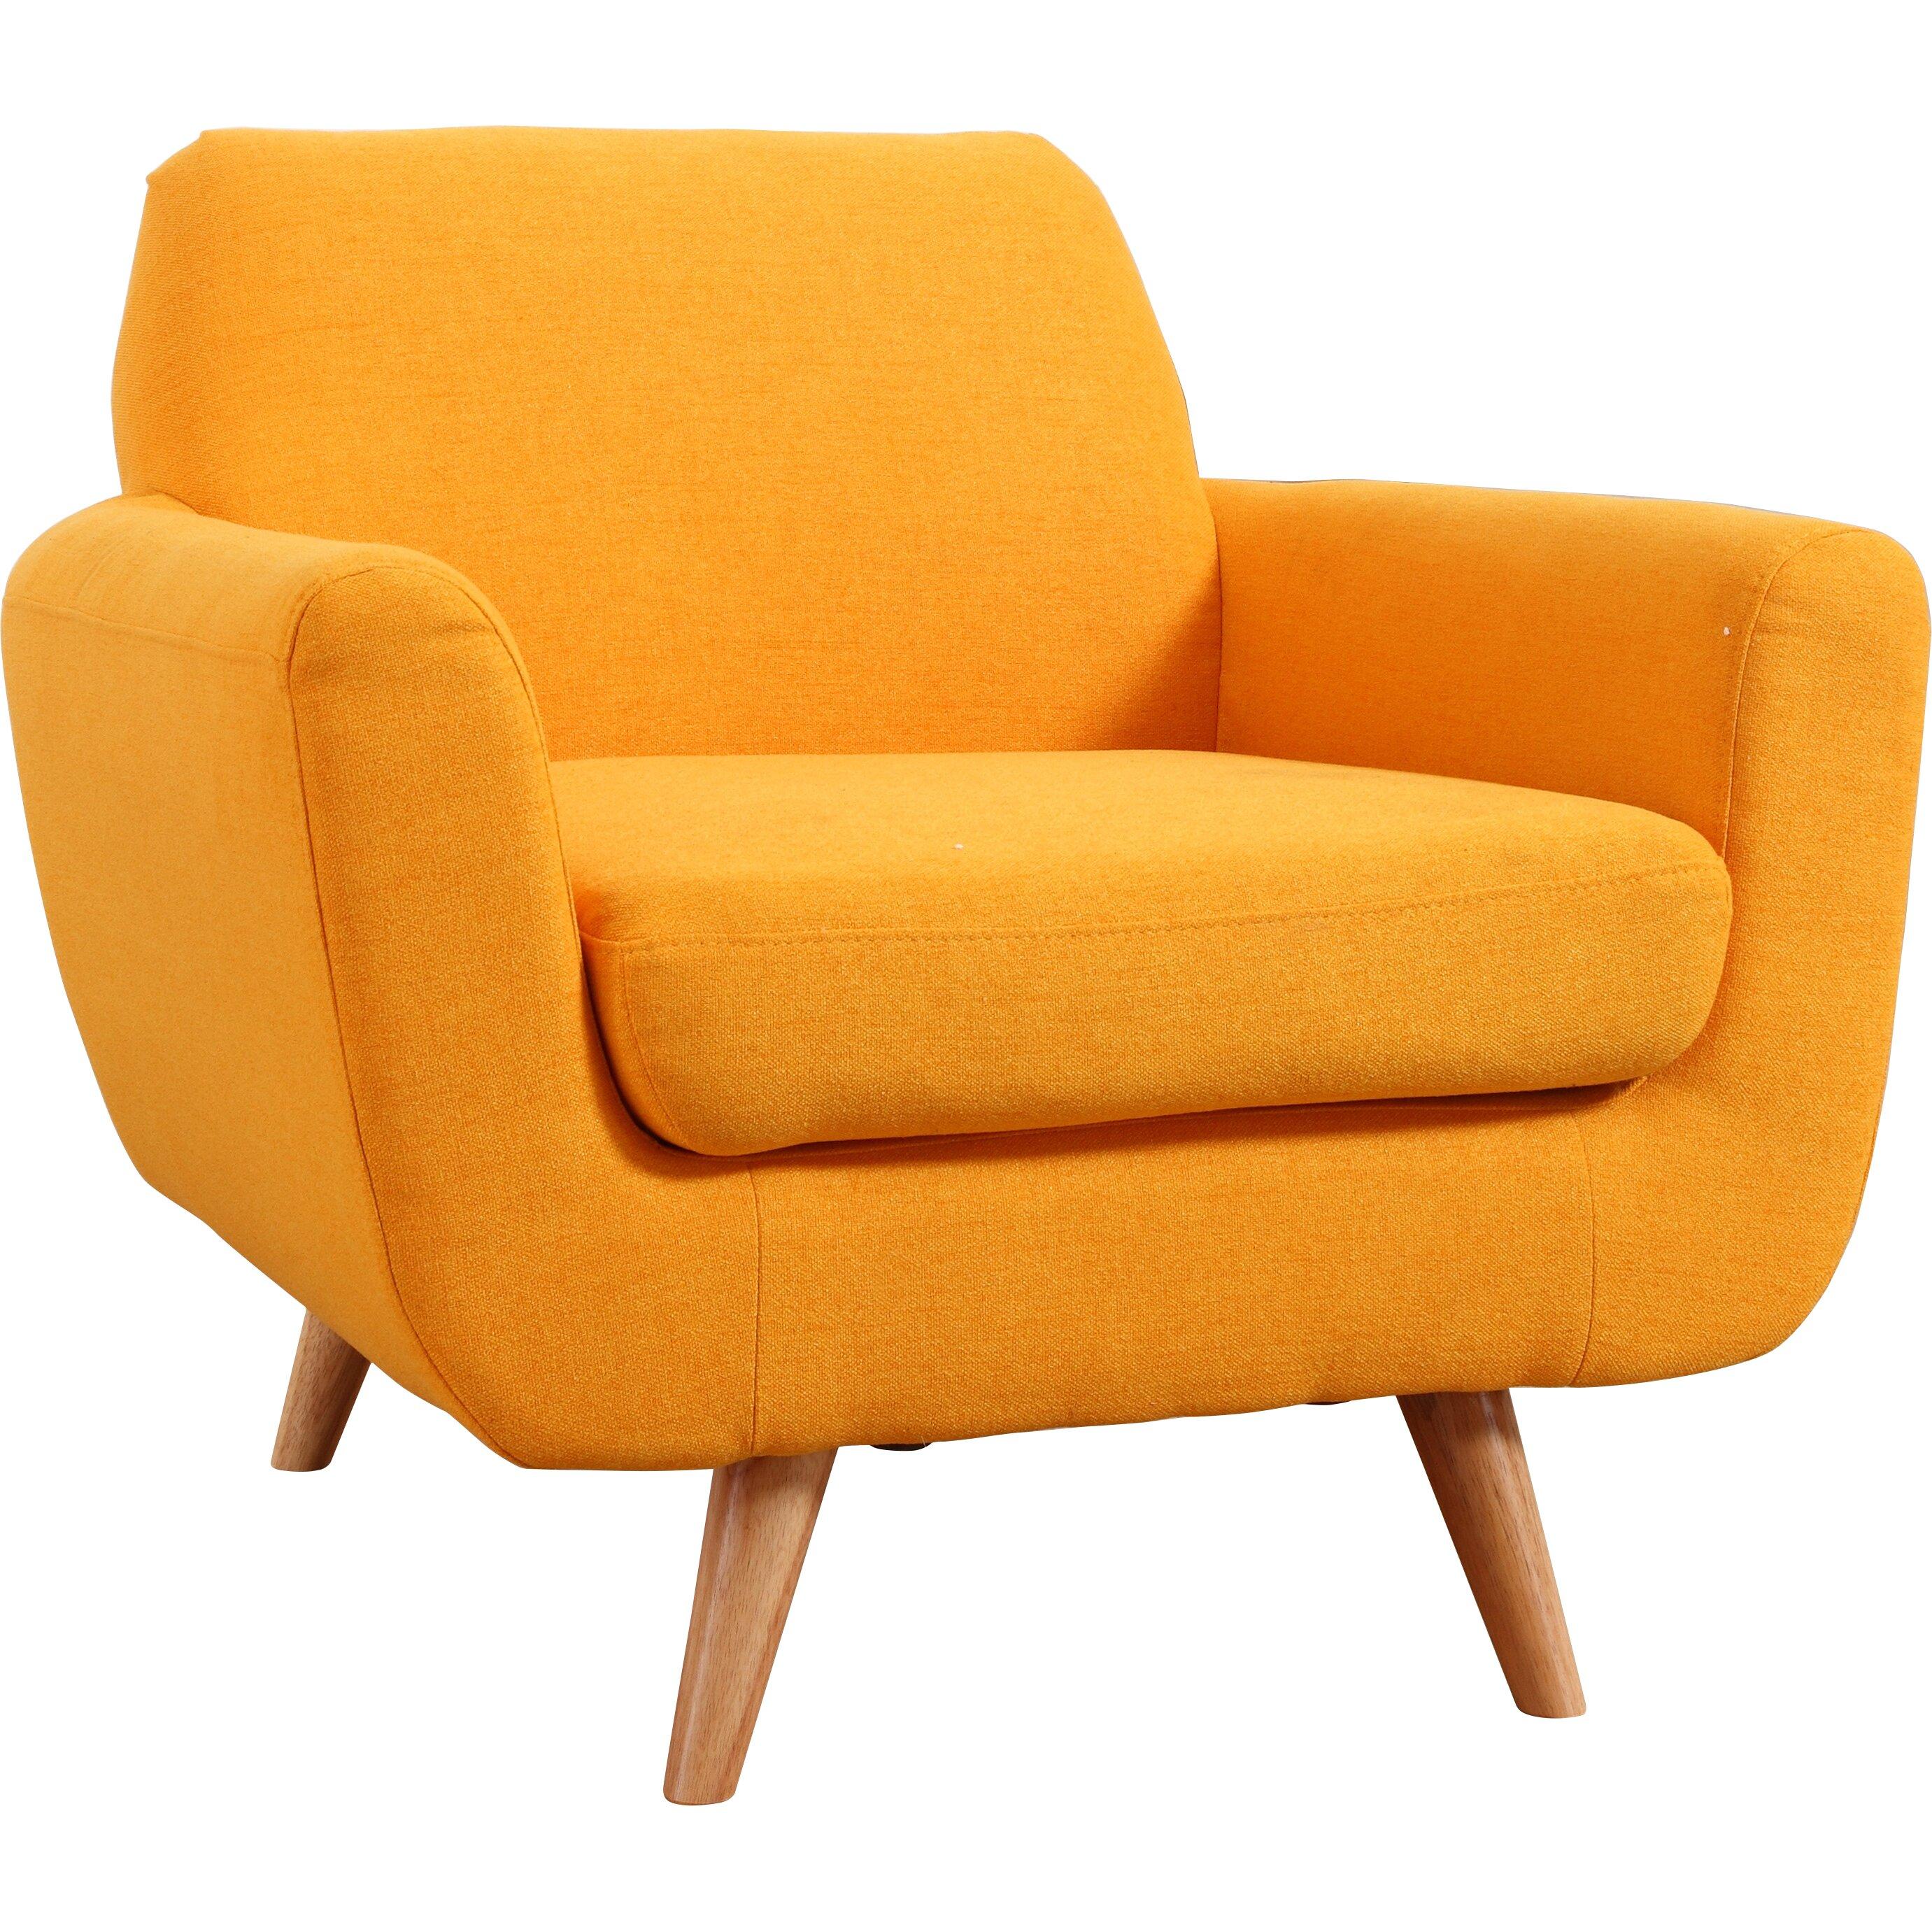 Midcentury Modern Armchair: Madison Home USA Mid-Century Modern Accent Armchair